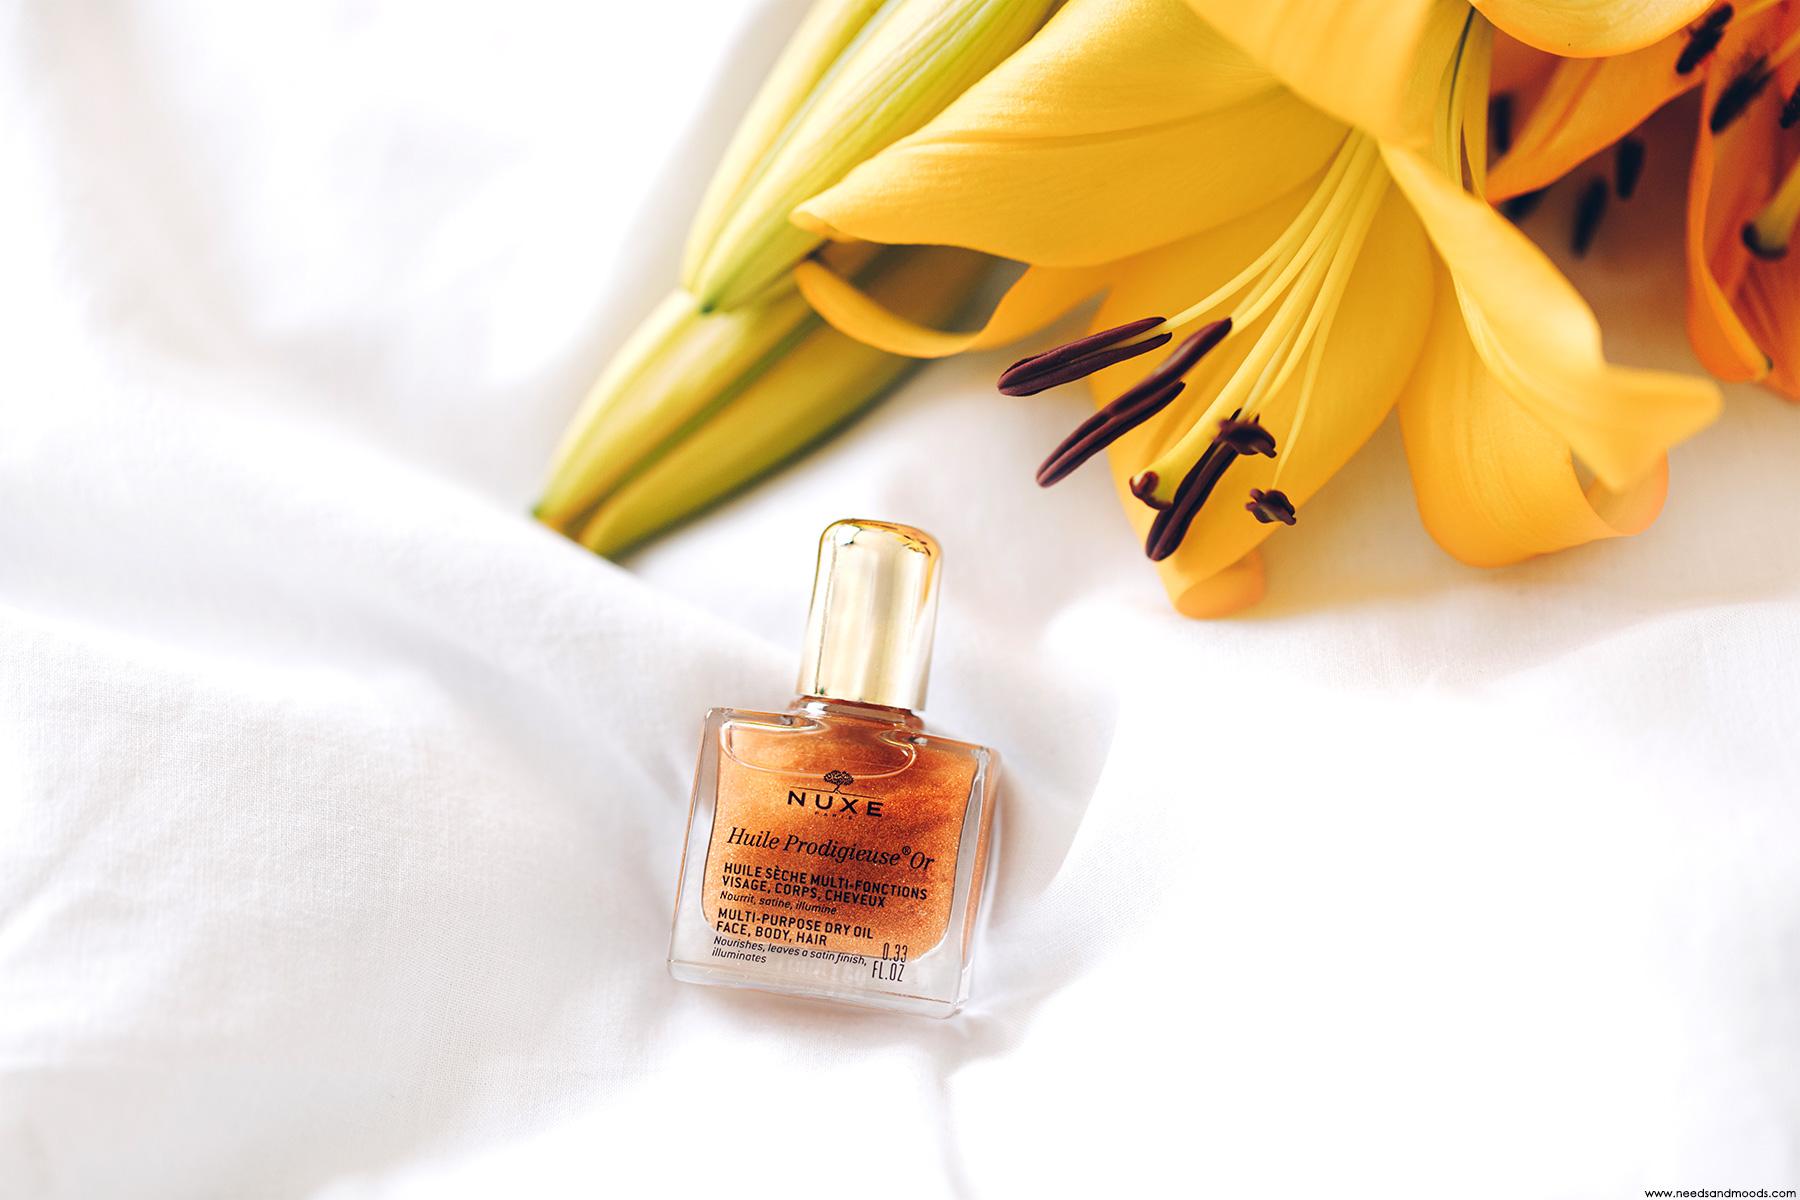 nuxe box beaute huile prodigieuse